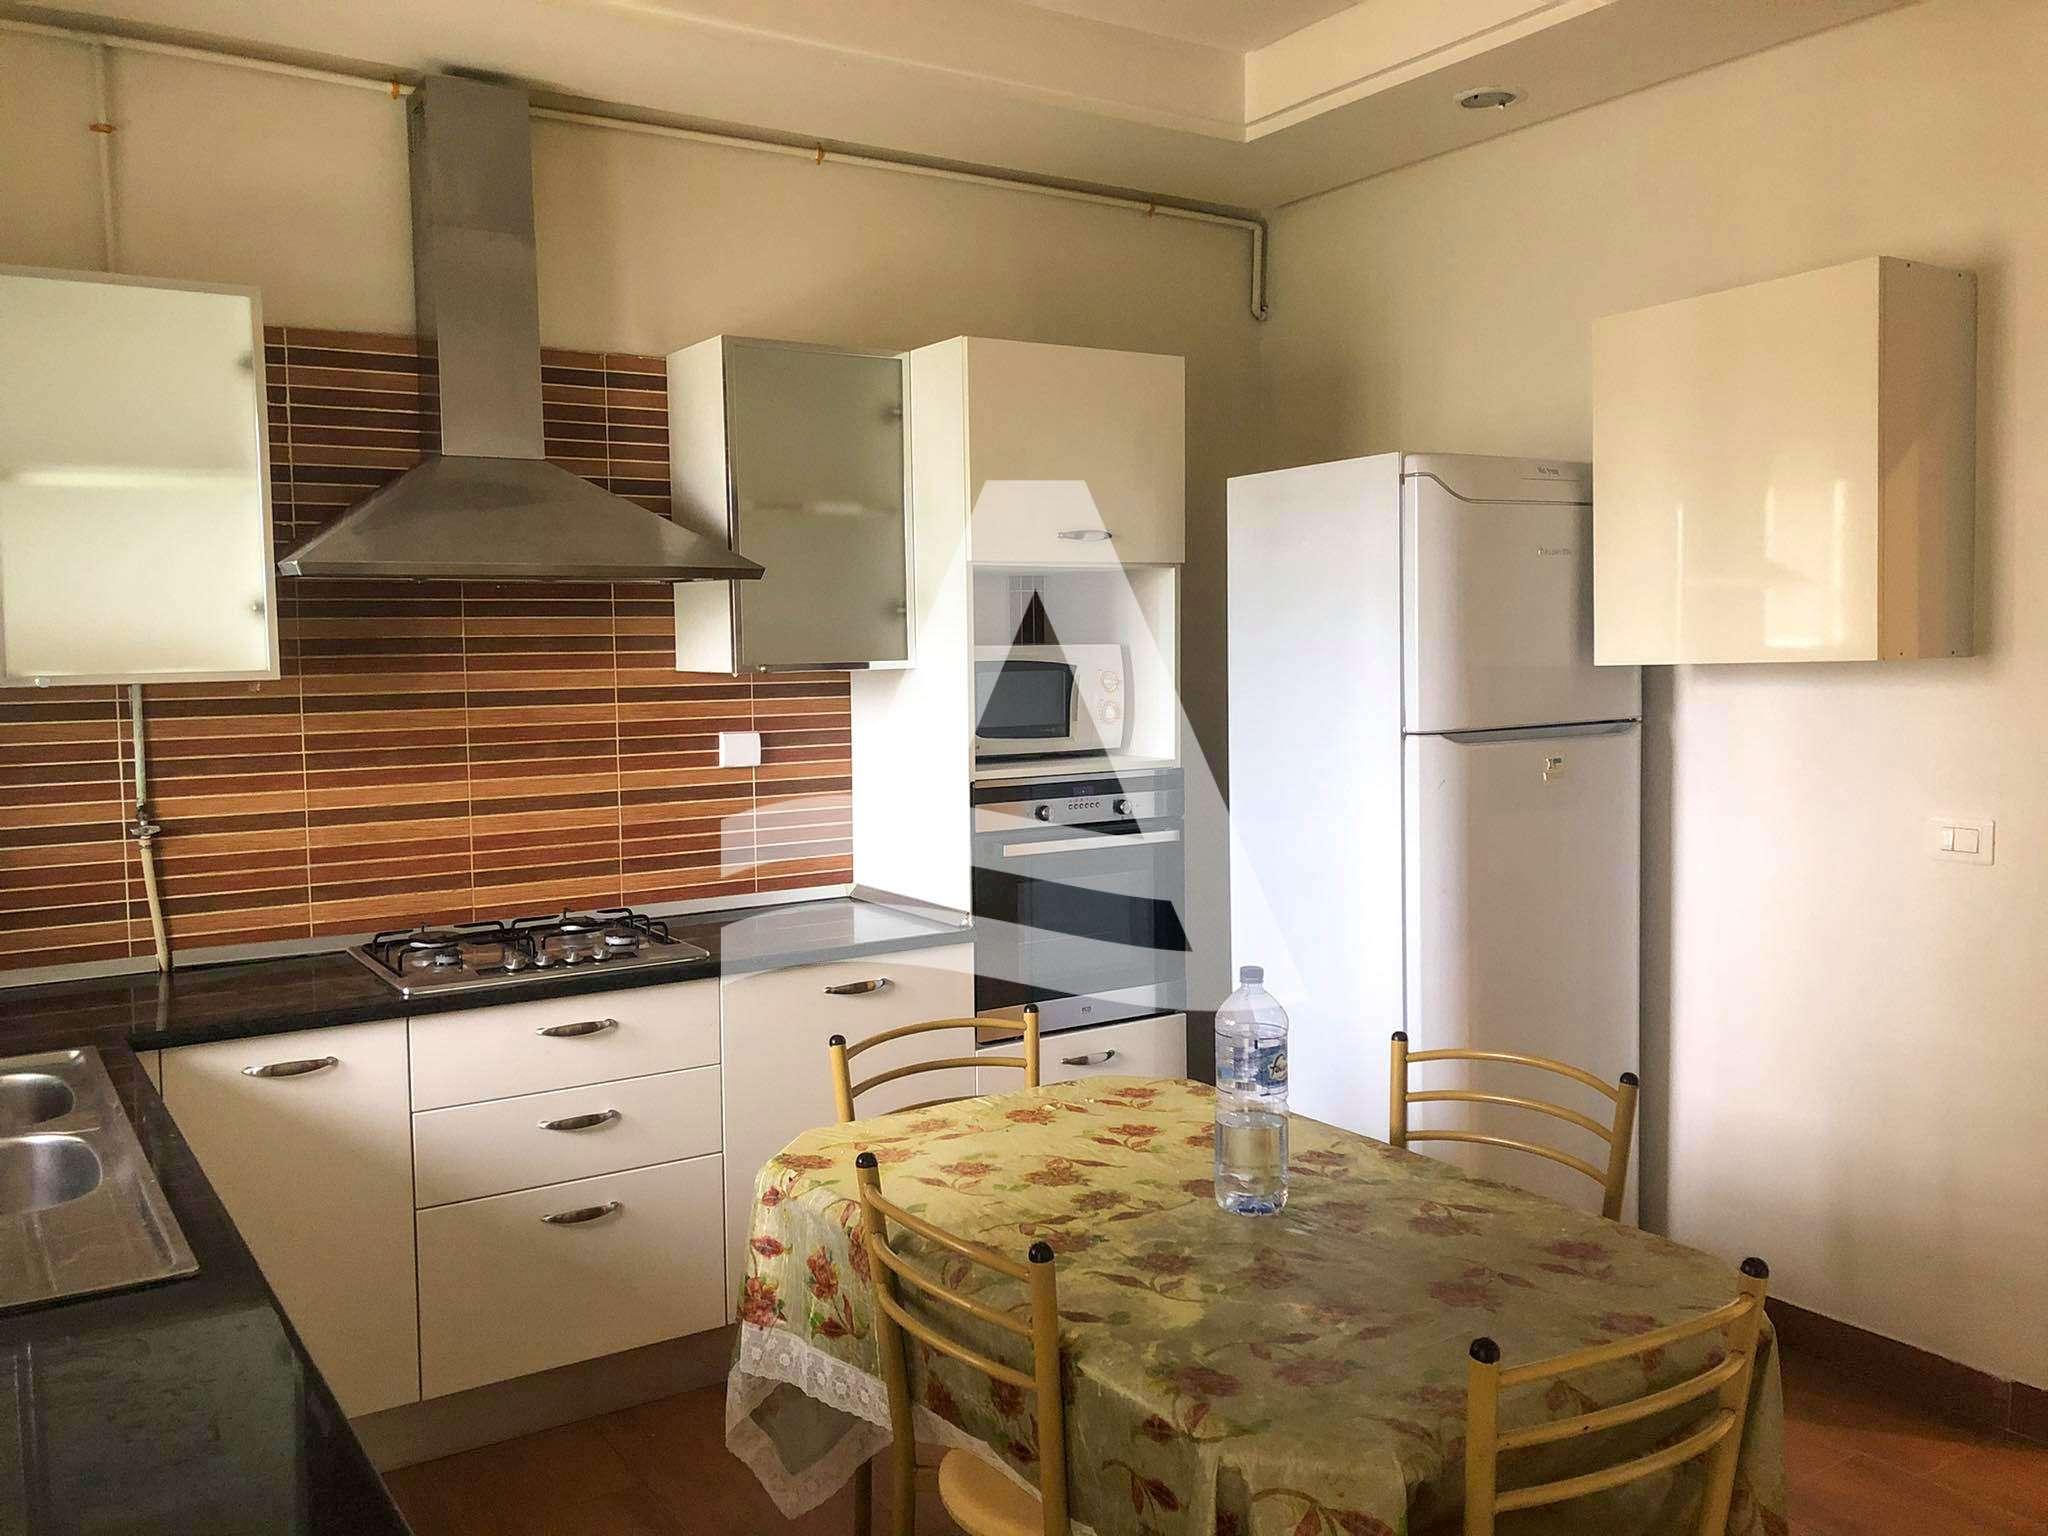 httpss3.amazonaws.comlogimoaws4690512091608282244appartement_jardin_de_carthage_14_sur_16